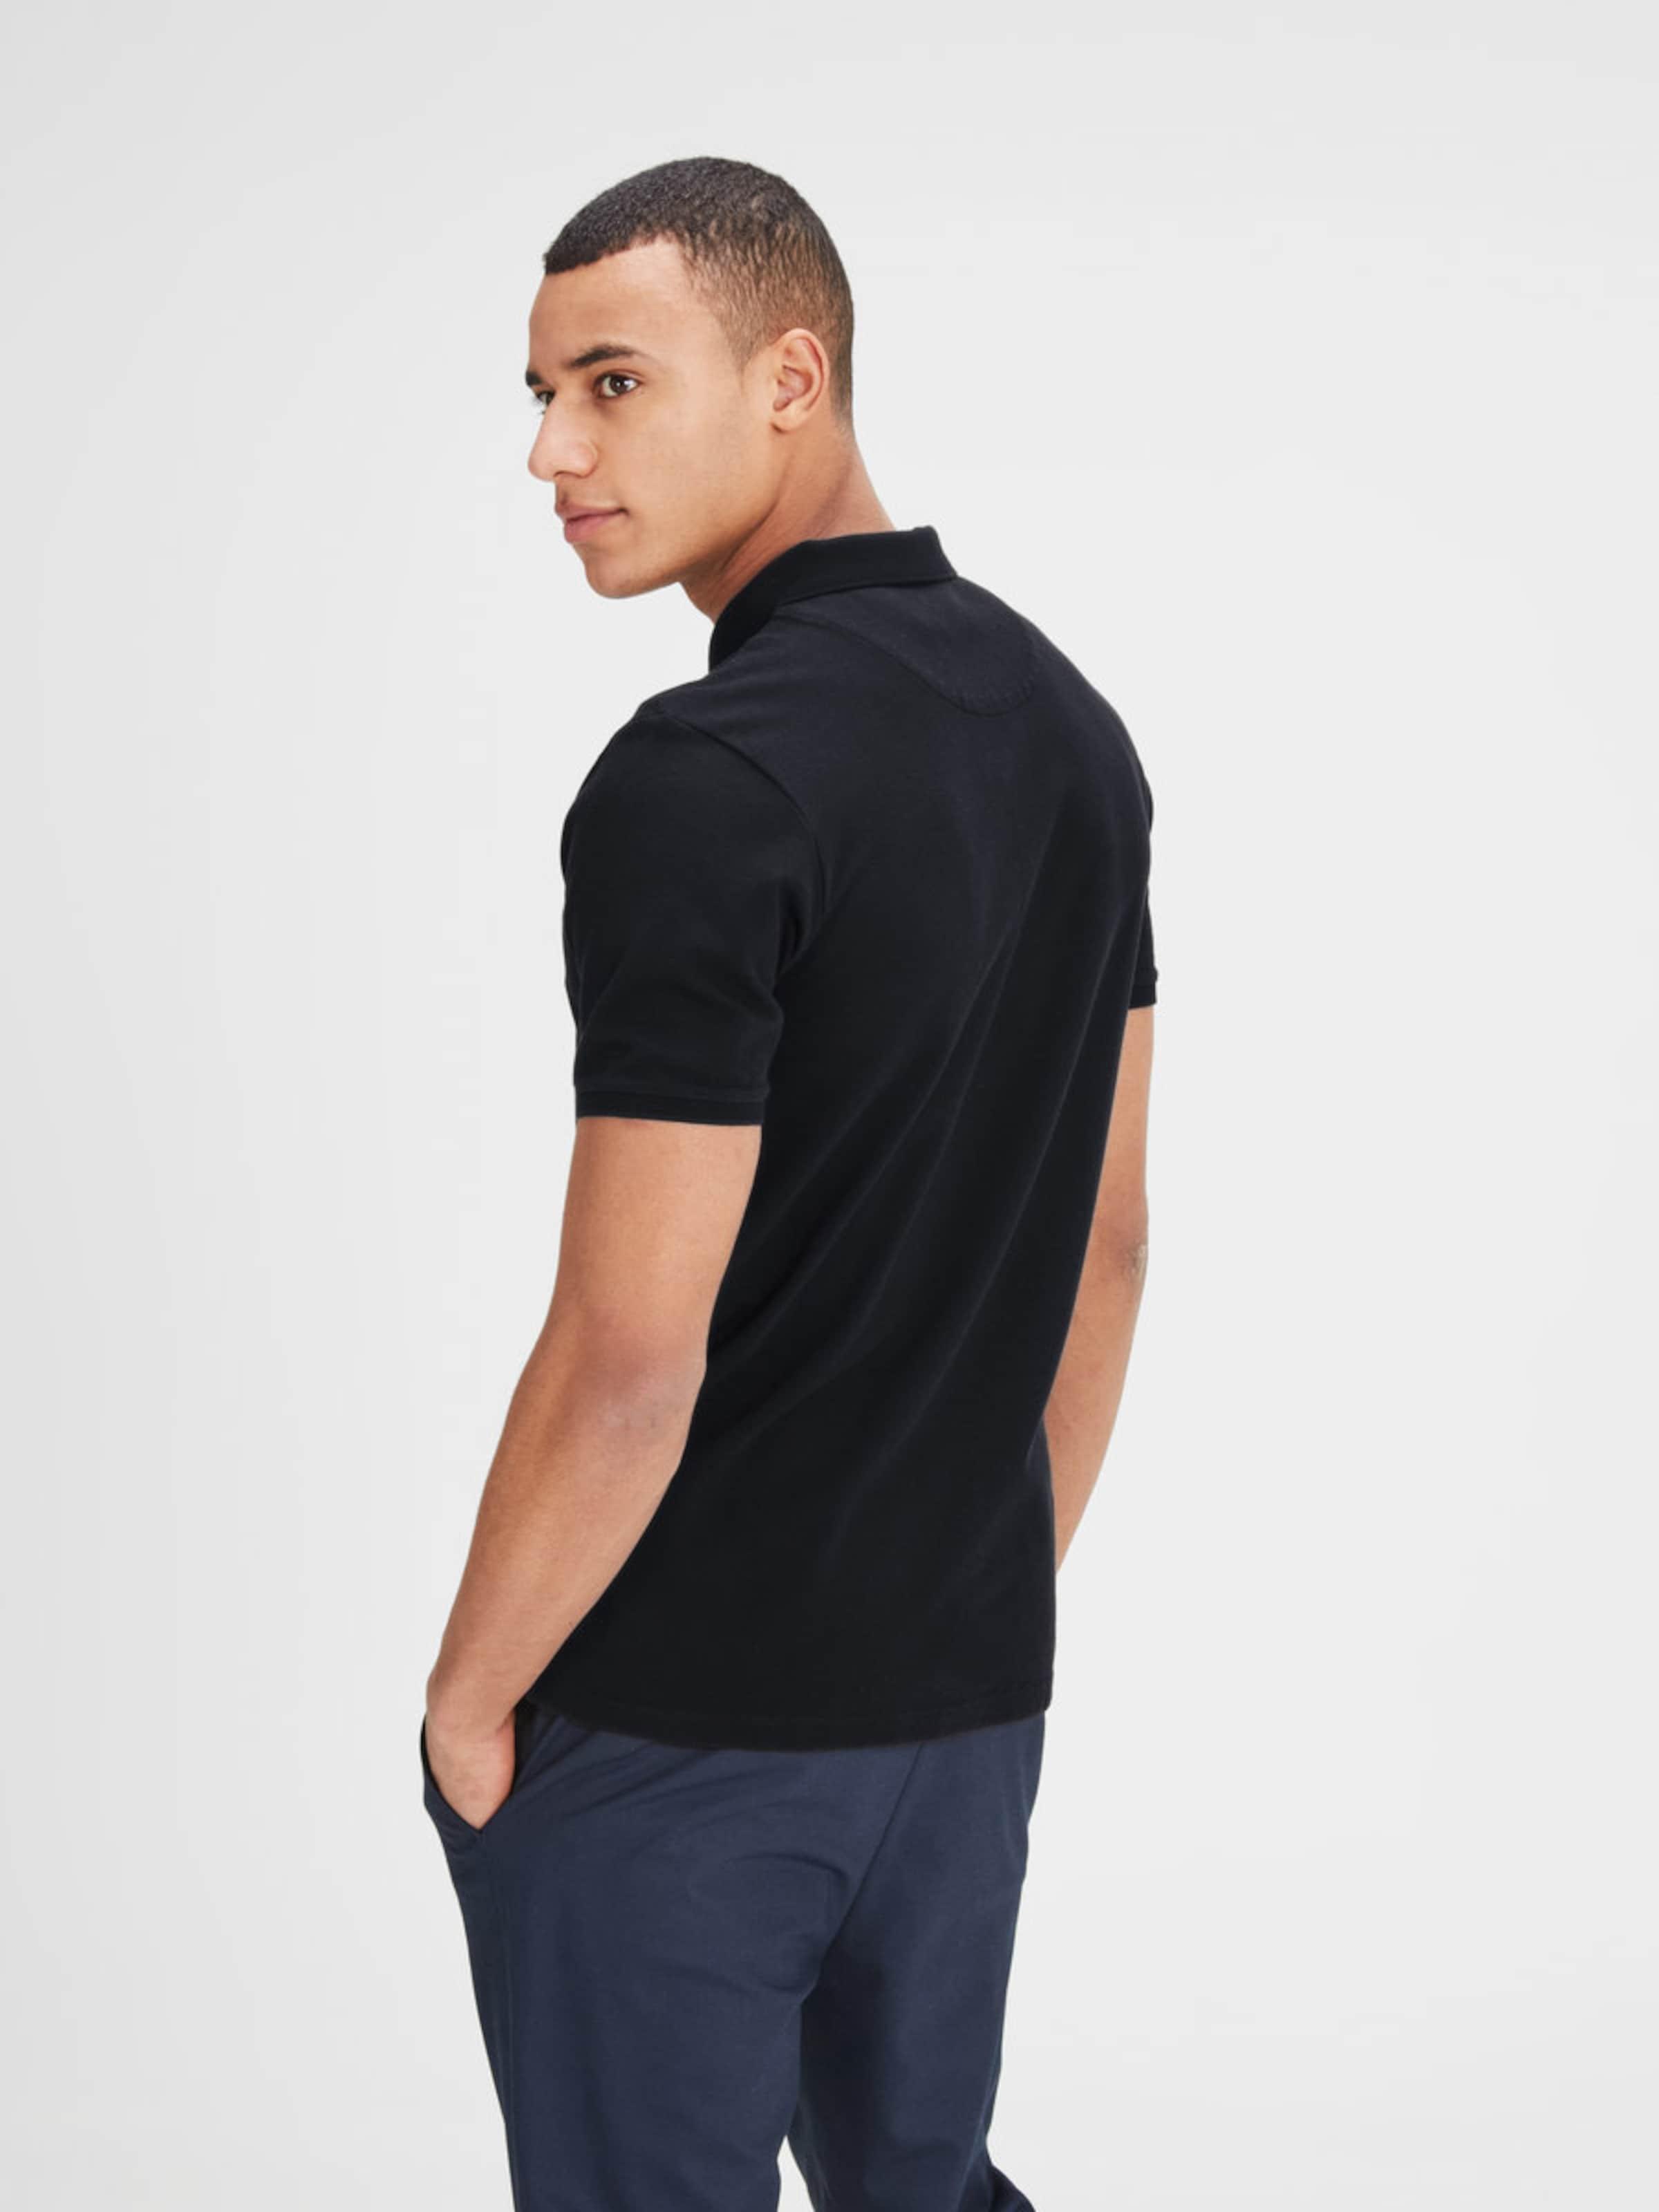 Mode Online-Verkauf JACK & JONES Poloshirt Lässiges Günstig Kaufen Fabrikverkauf Guter Service Freies Verschiffen Besuch Neu tOk76D